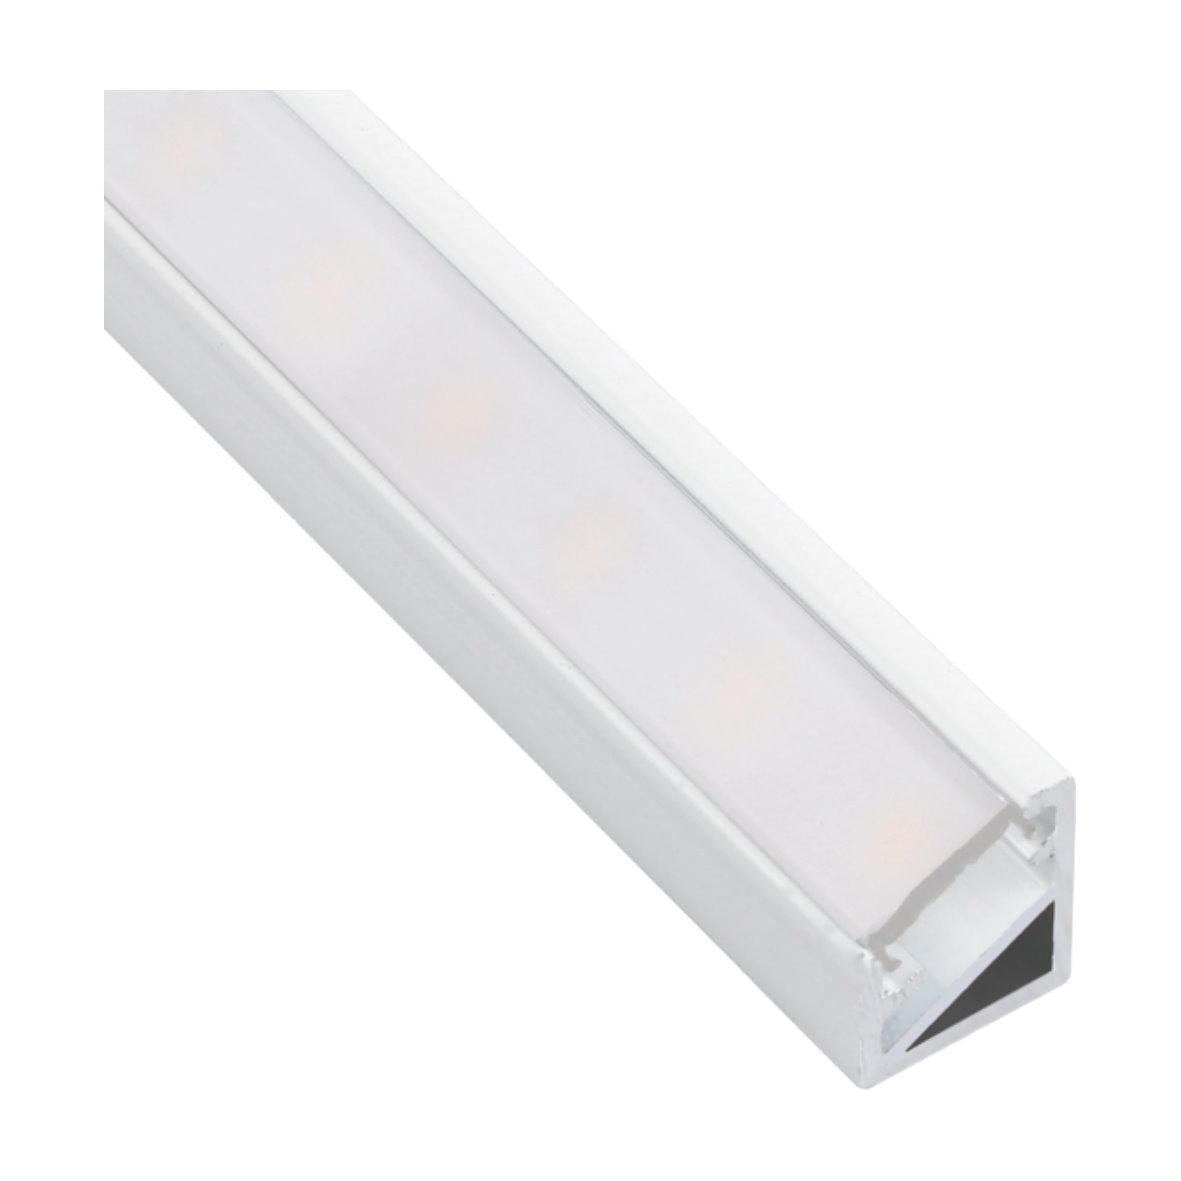 14 9 m alu profil 2m abdeckung f r led streifen strip lichtband aluminium ebay. Black Bedroom Furniture Sets. Home Design Ideas